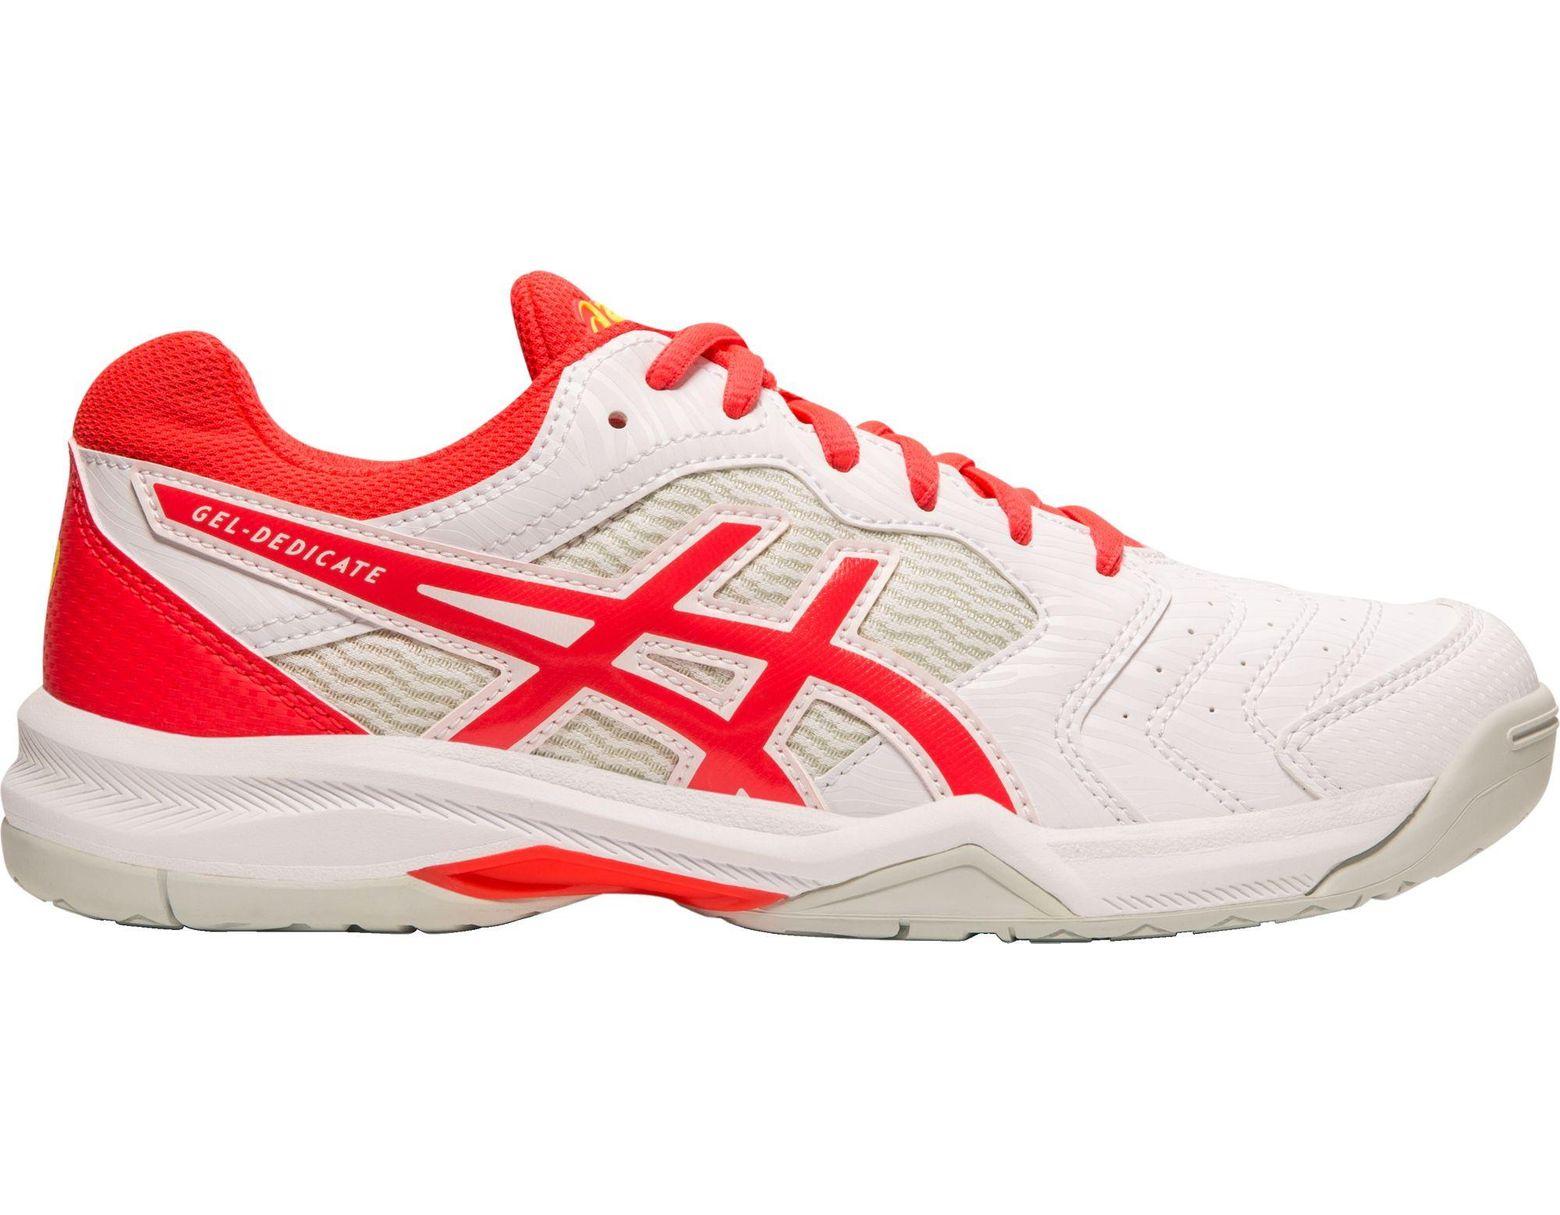 ccbcc52b925a58 Asics Gel Dedicate 6 Tennis Shoes - Lyst